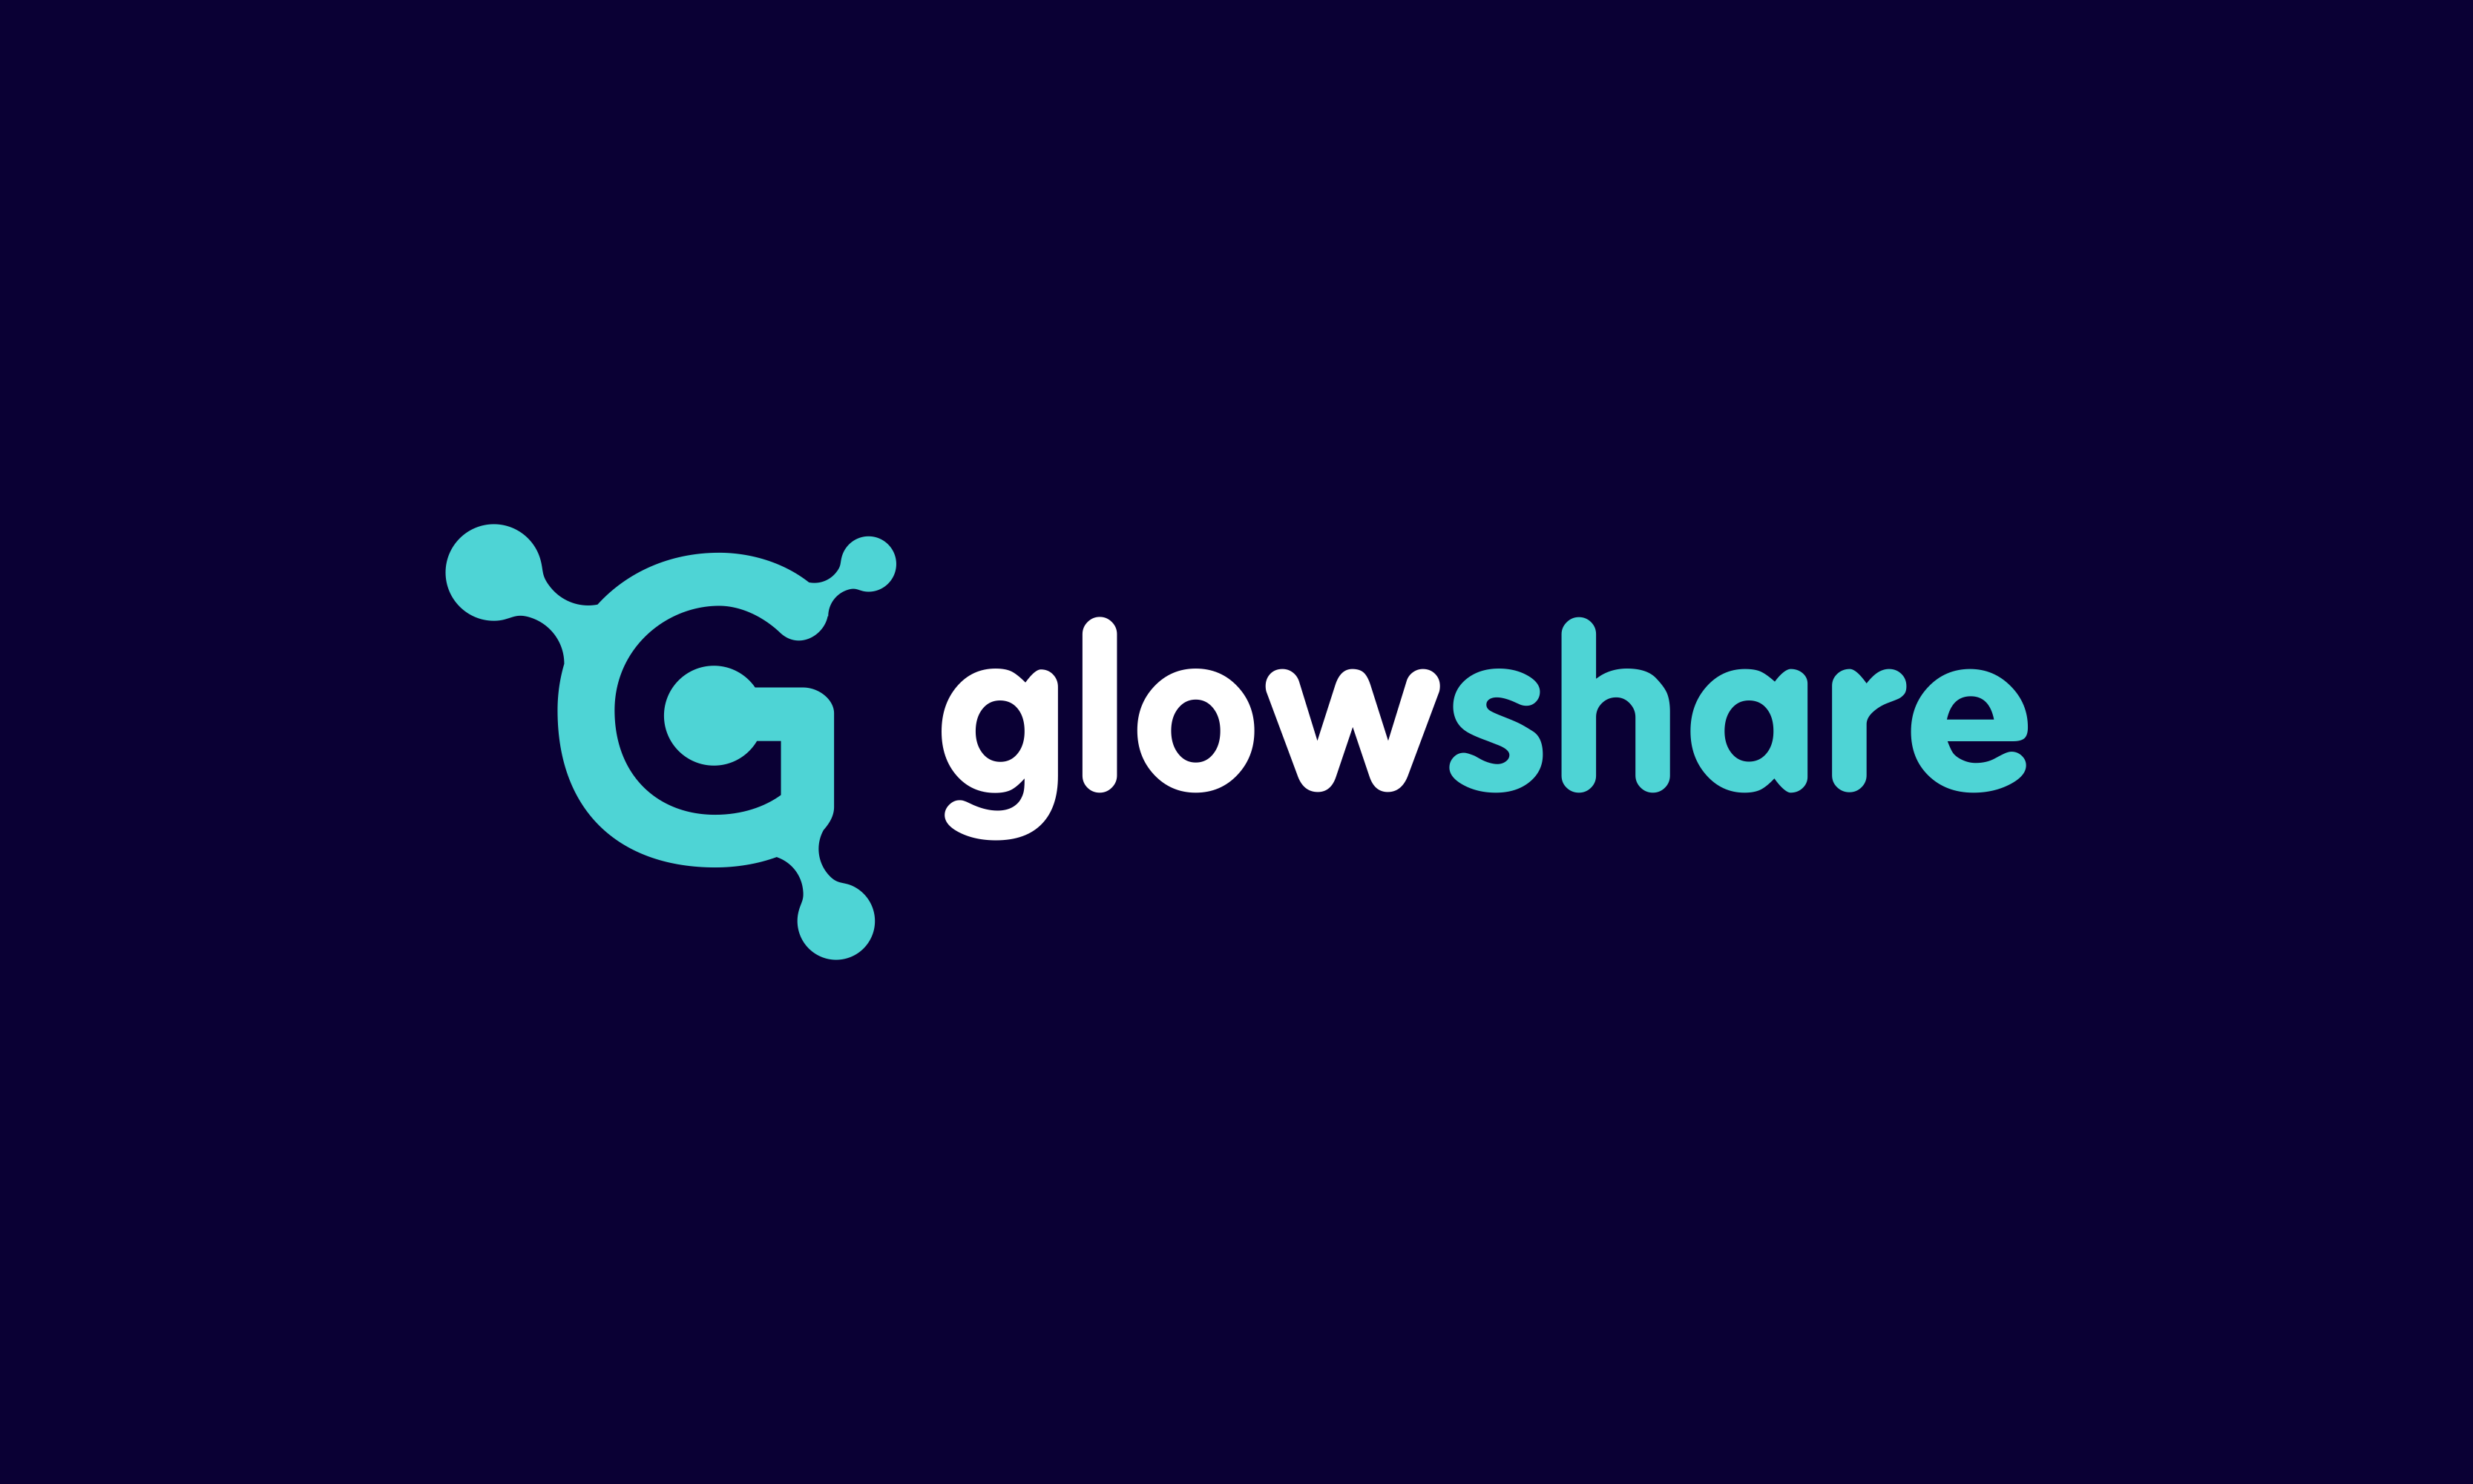 Glowshare